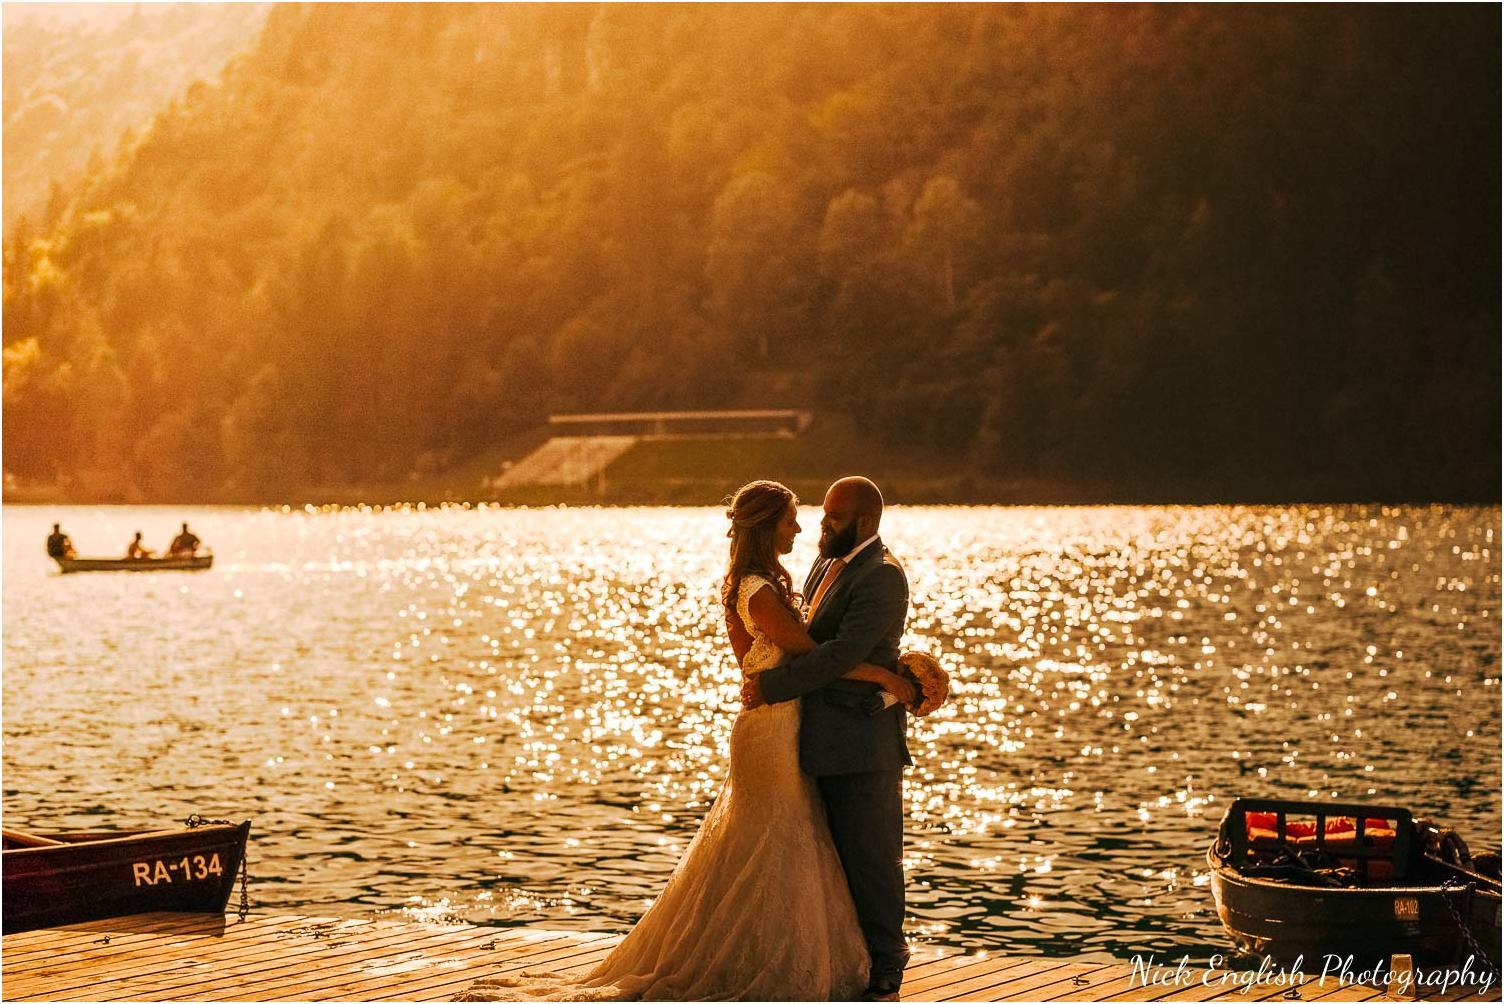 Destination_Wedding_Photographer_Slovenia_Nick_English_Photography-70-22.jpg